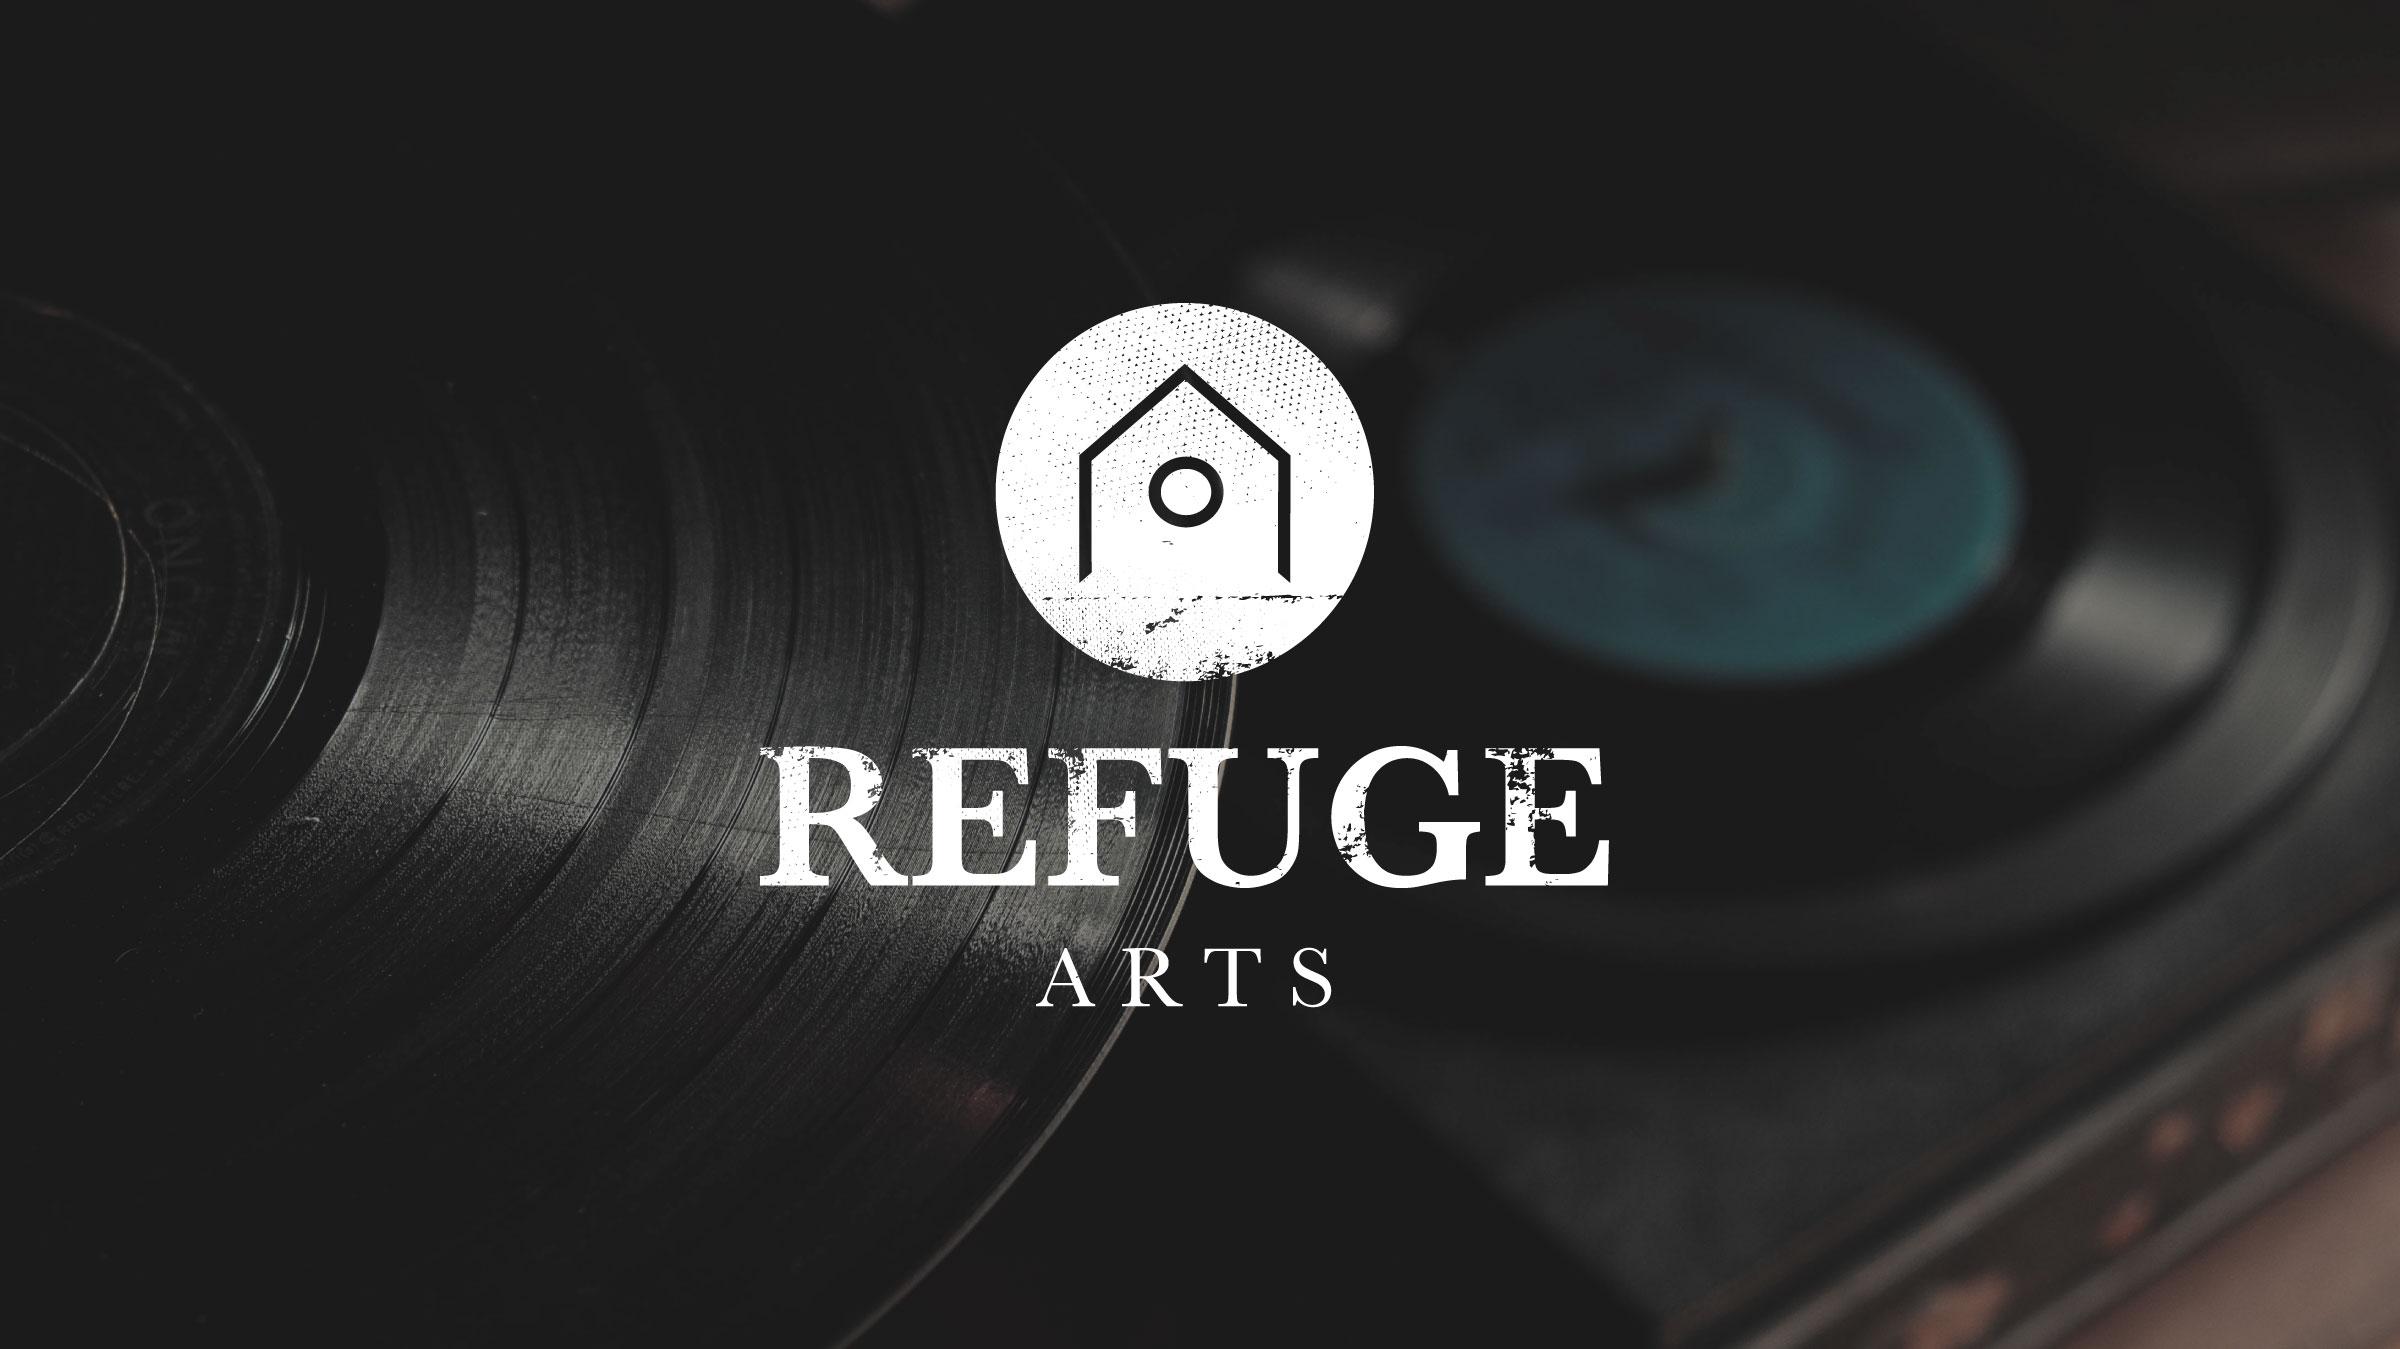 Refuge Arts concept against records.